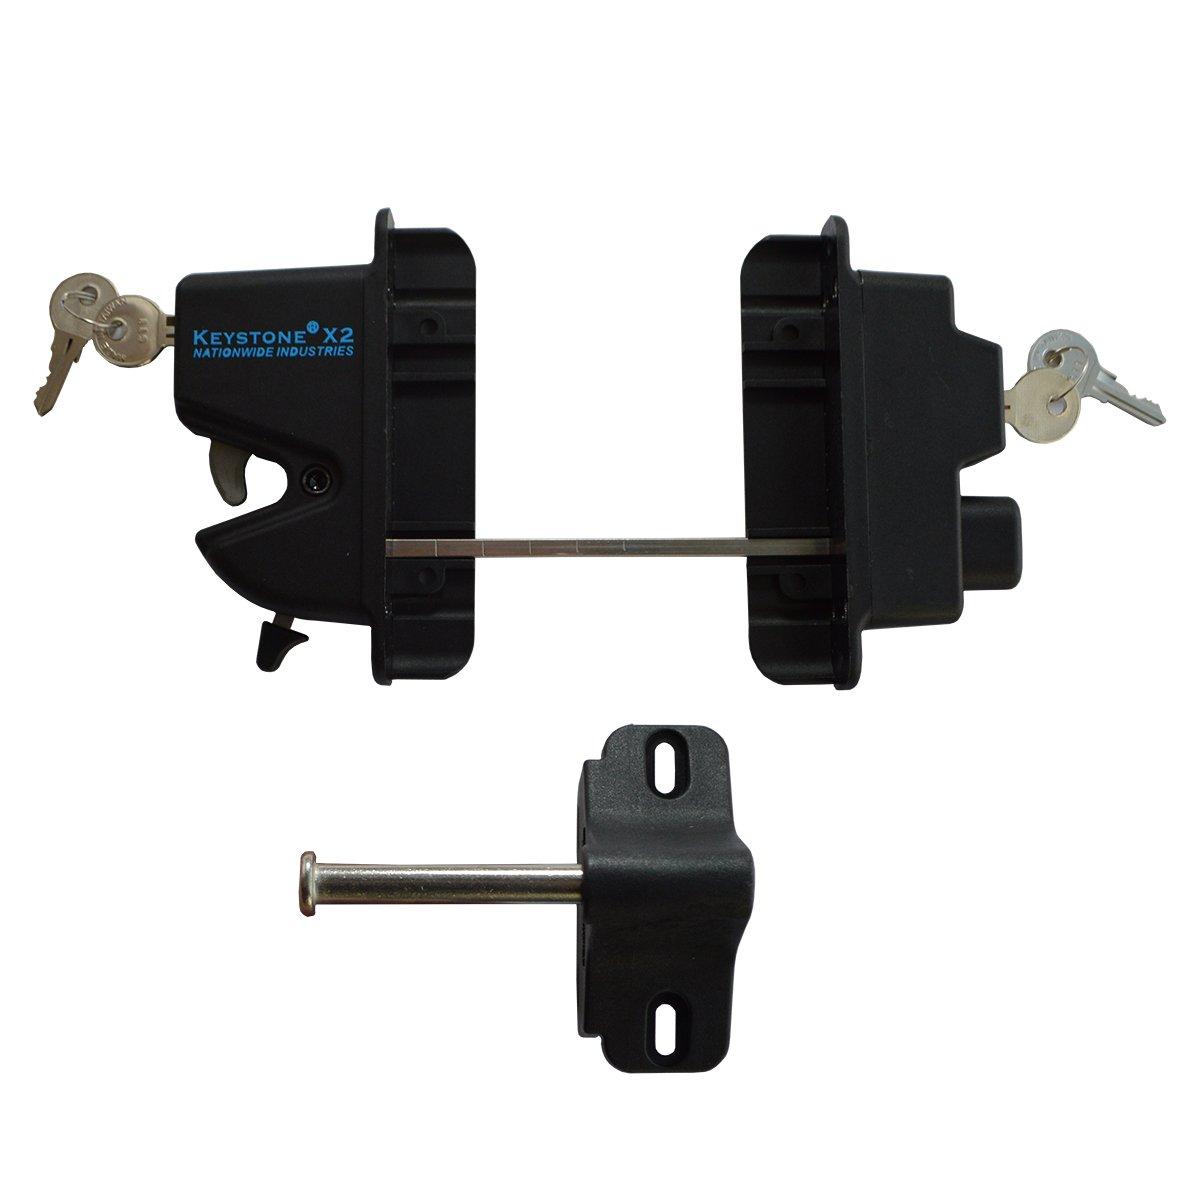 Nationwide Industries Black Nylon Polymer Keystone X2 External Gate Latch With External Access   Keyed Alike   KLX2-P2-BK-KA